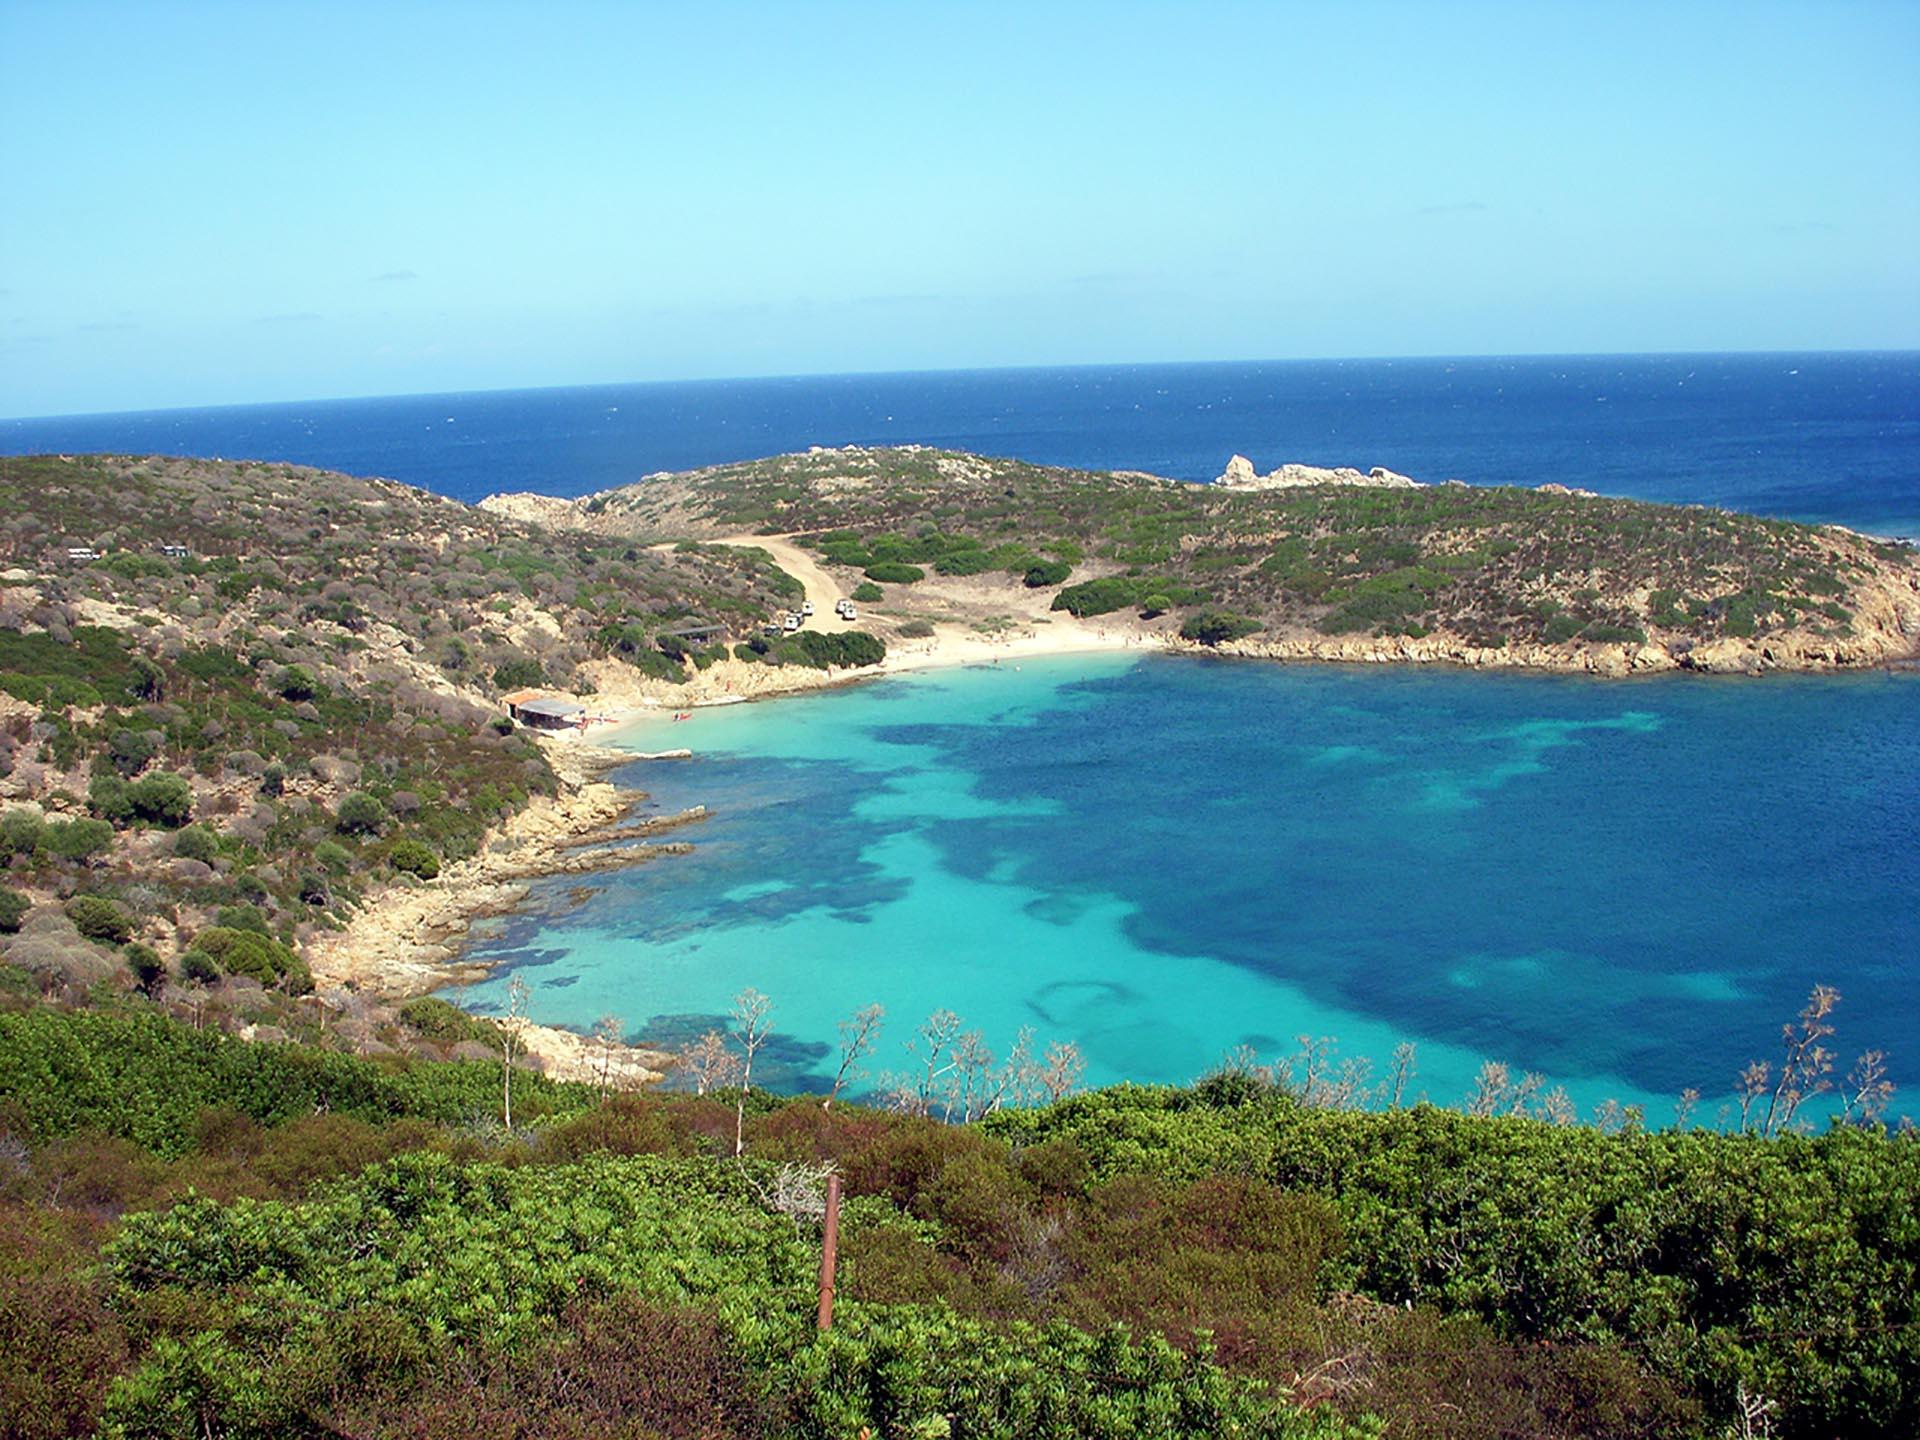 Cala Sabina, Isola dell'Asinara, Sardegna